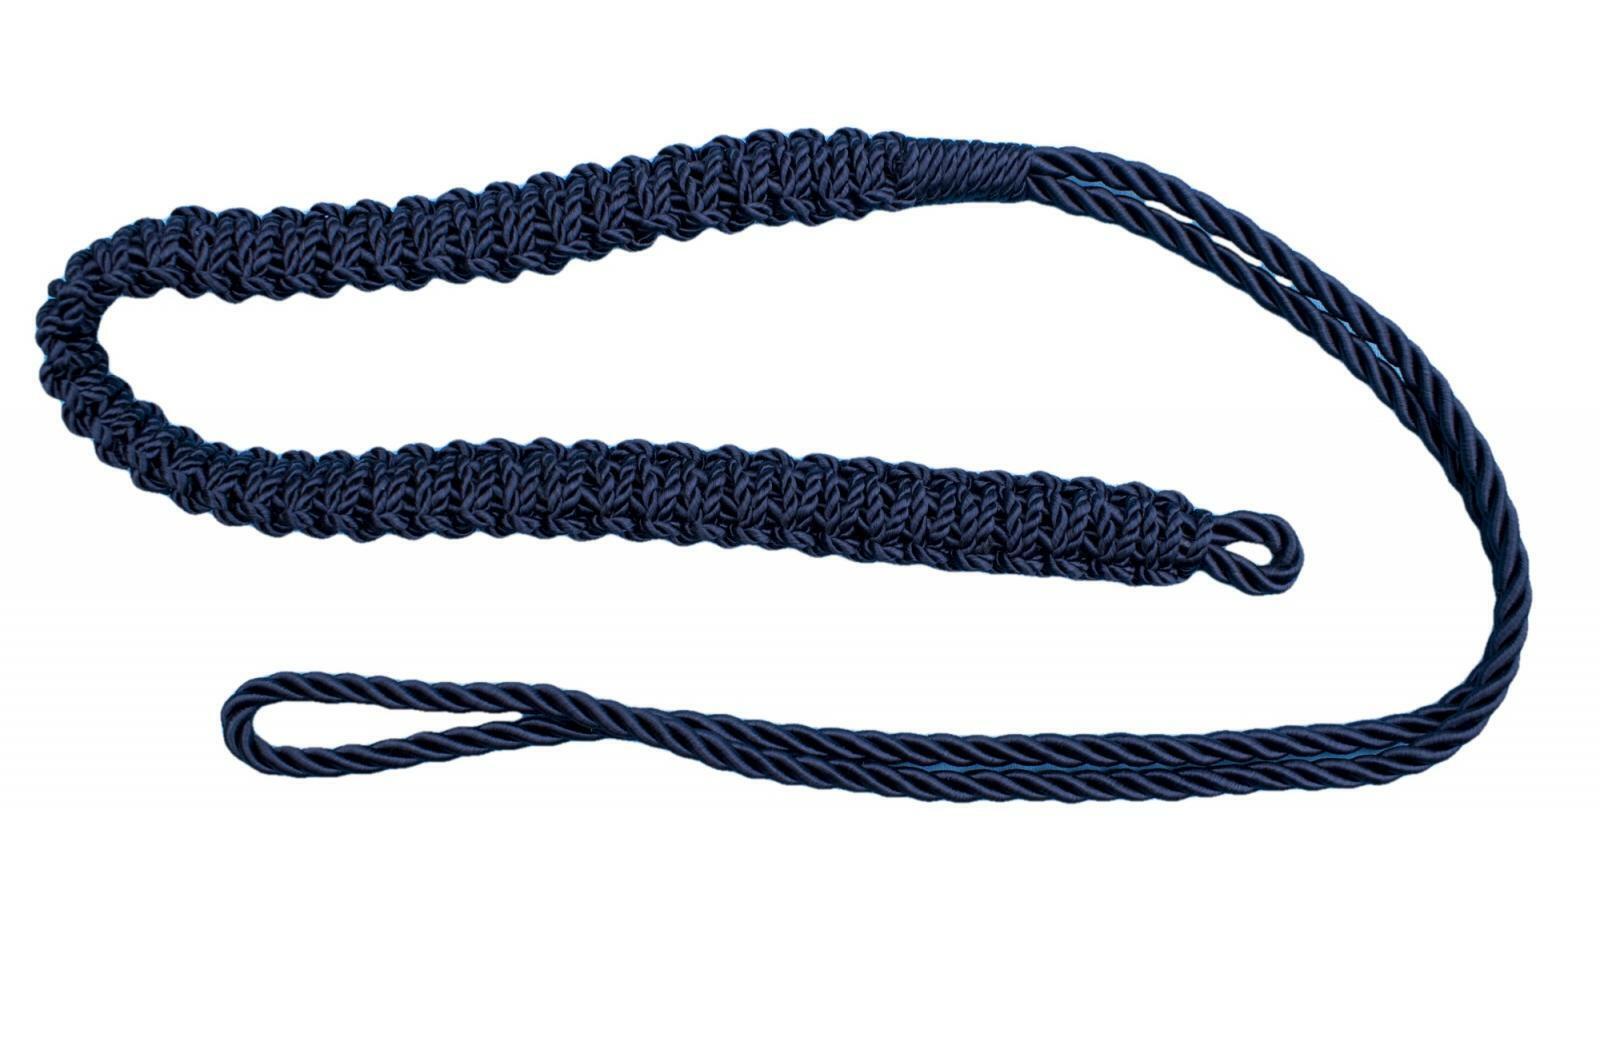 Lanyard Shoulder Cord Lanyard British Army Silk Navy Blue